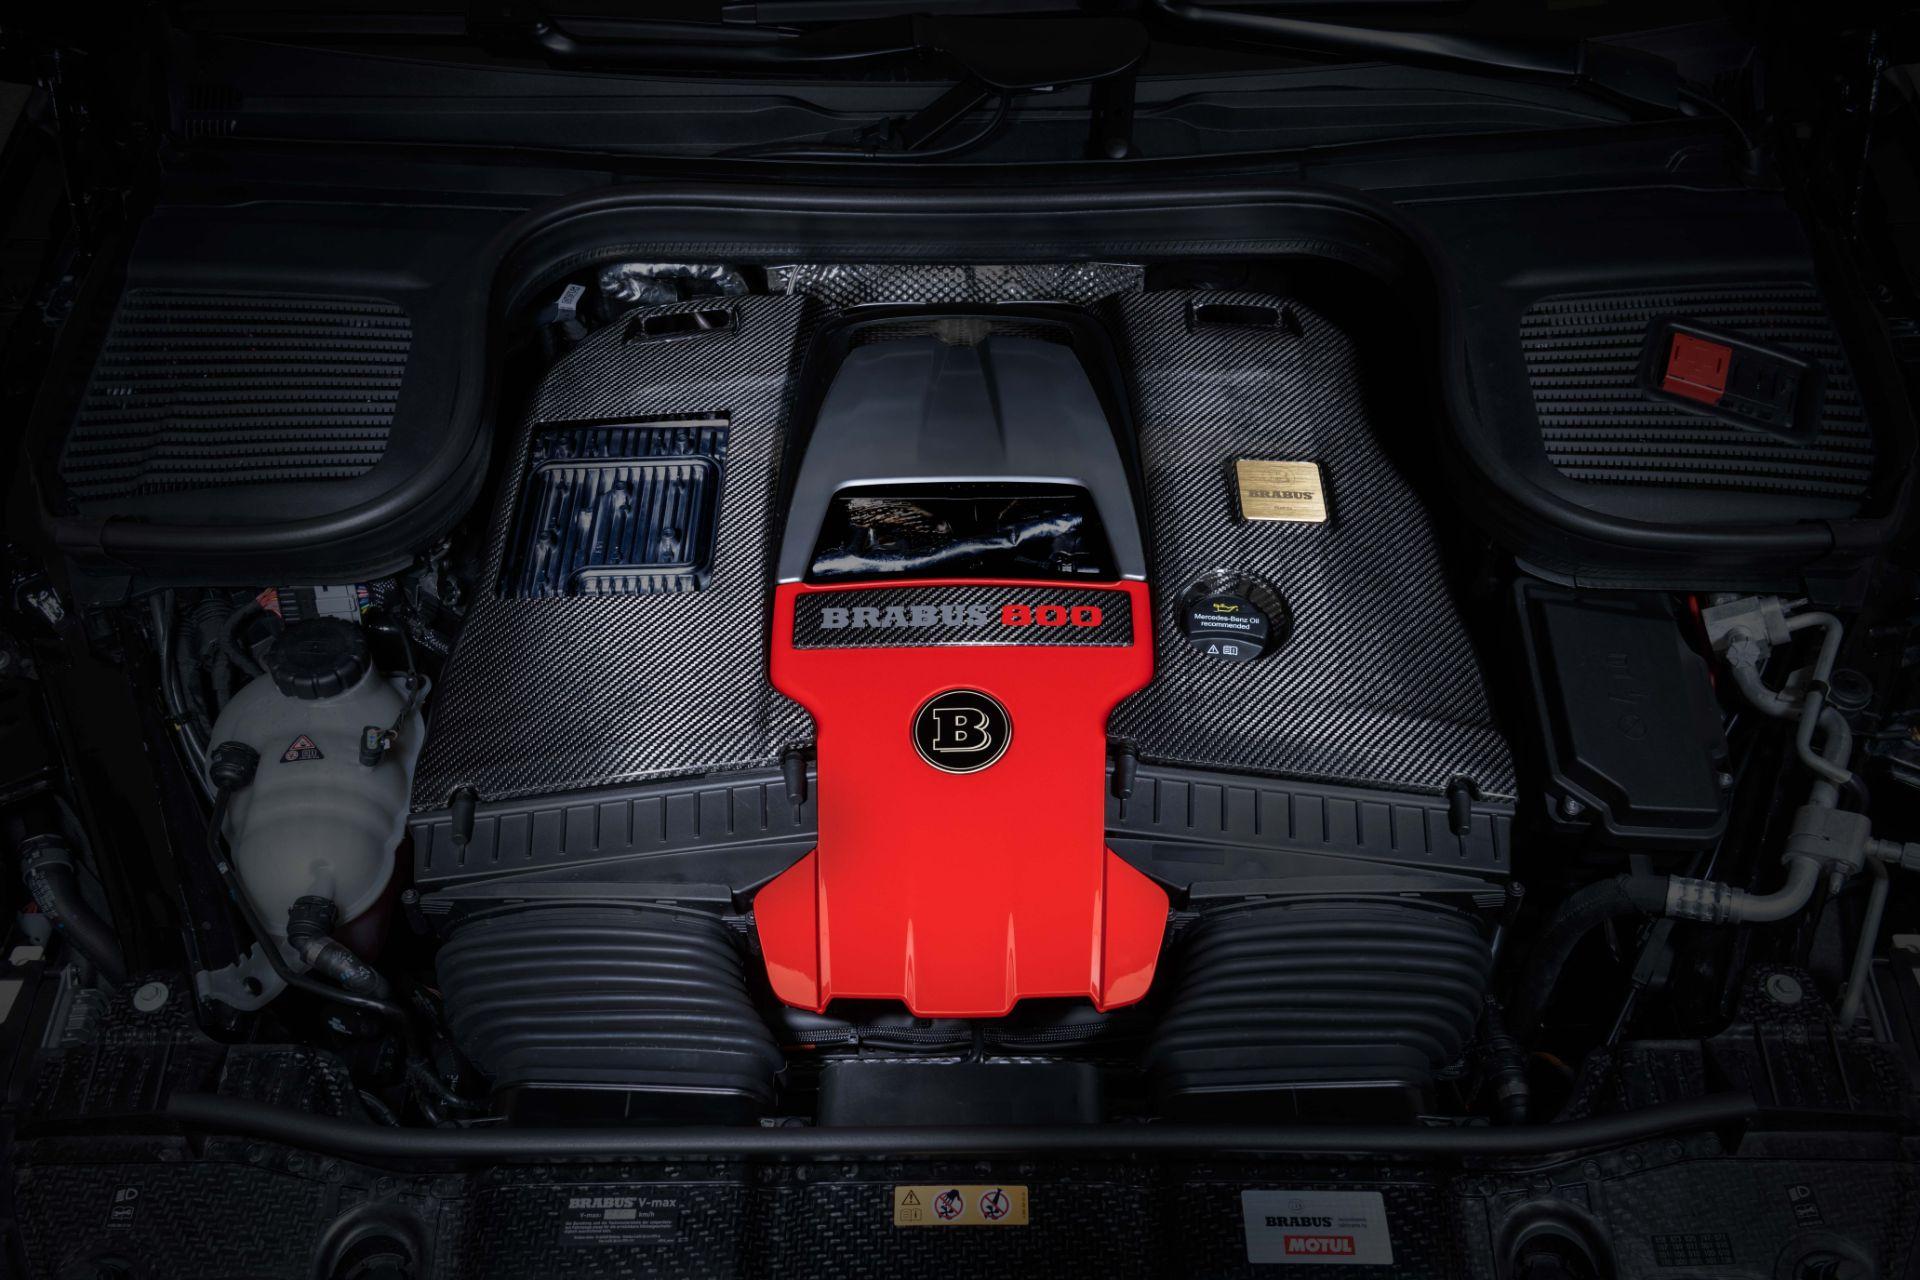 Brabus Mercedes-AMG GLE 63 S